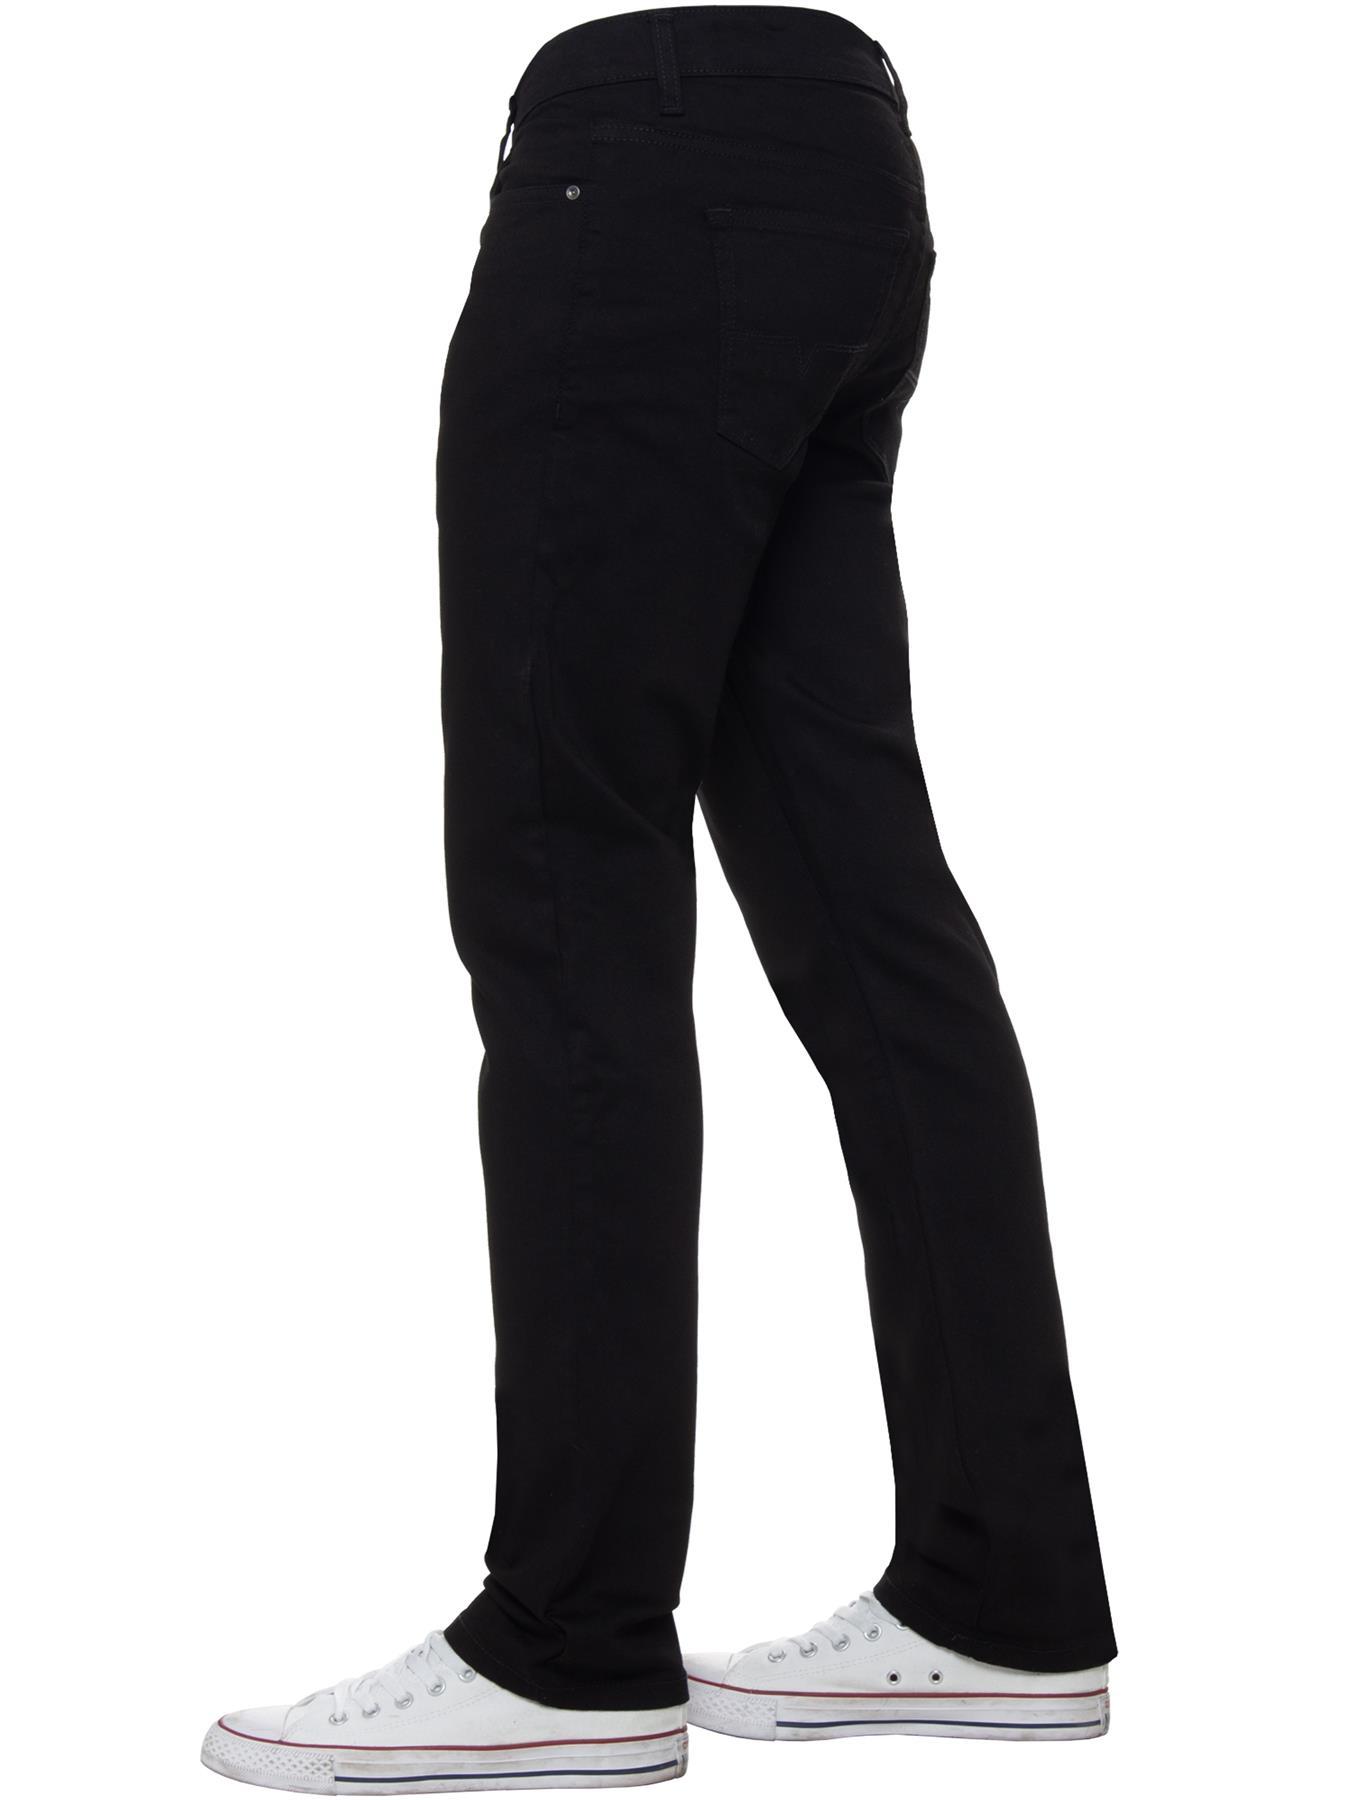 Para-Hombre-Pierna-Recta-Bootcut-Stretch-Denim-Regulares-Pantalon-de-trabajo-Kruze-Todas-Cinturas miniatura 23